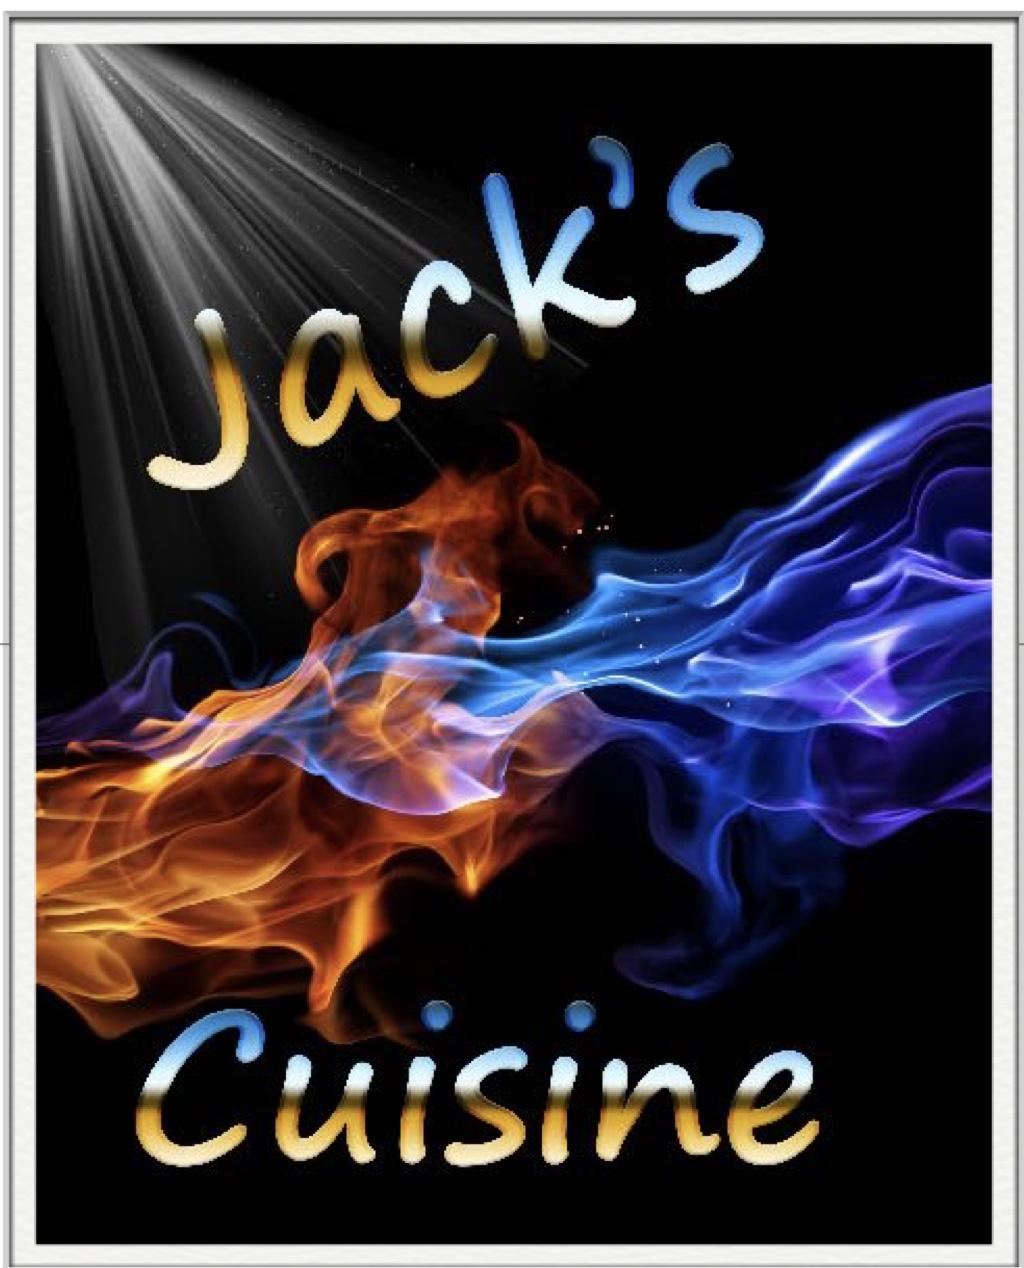 Jack's cuisine